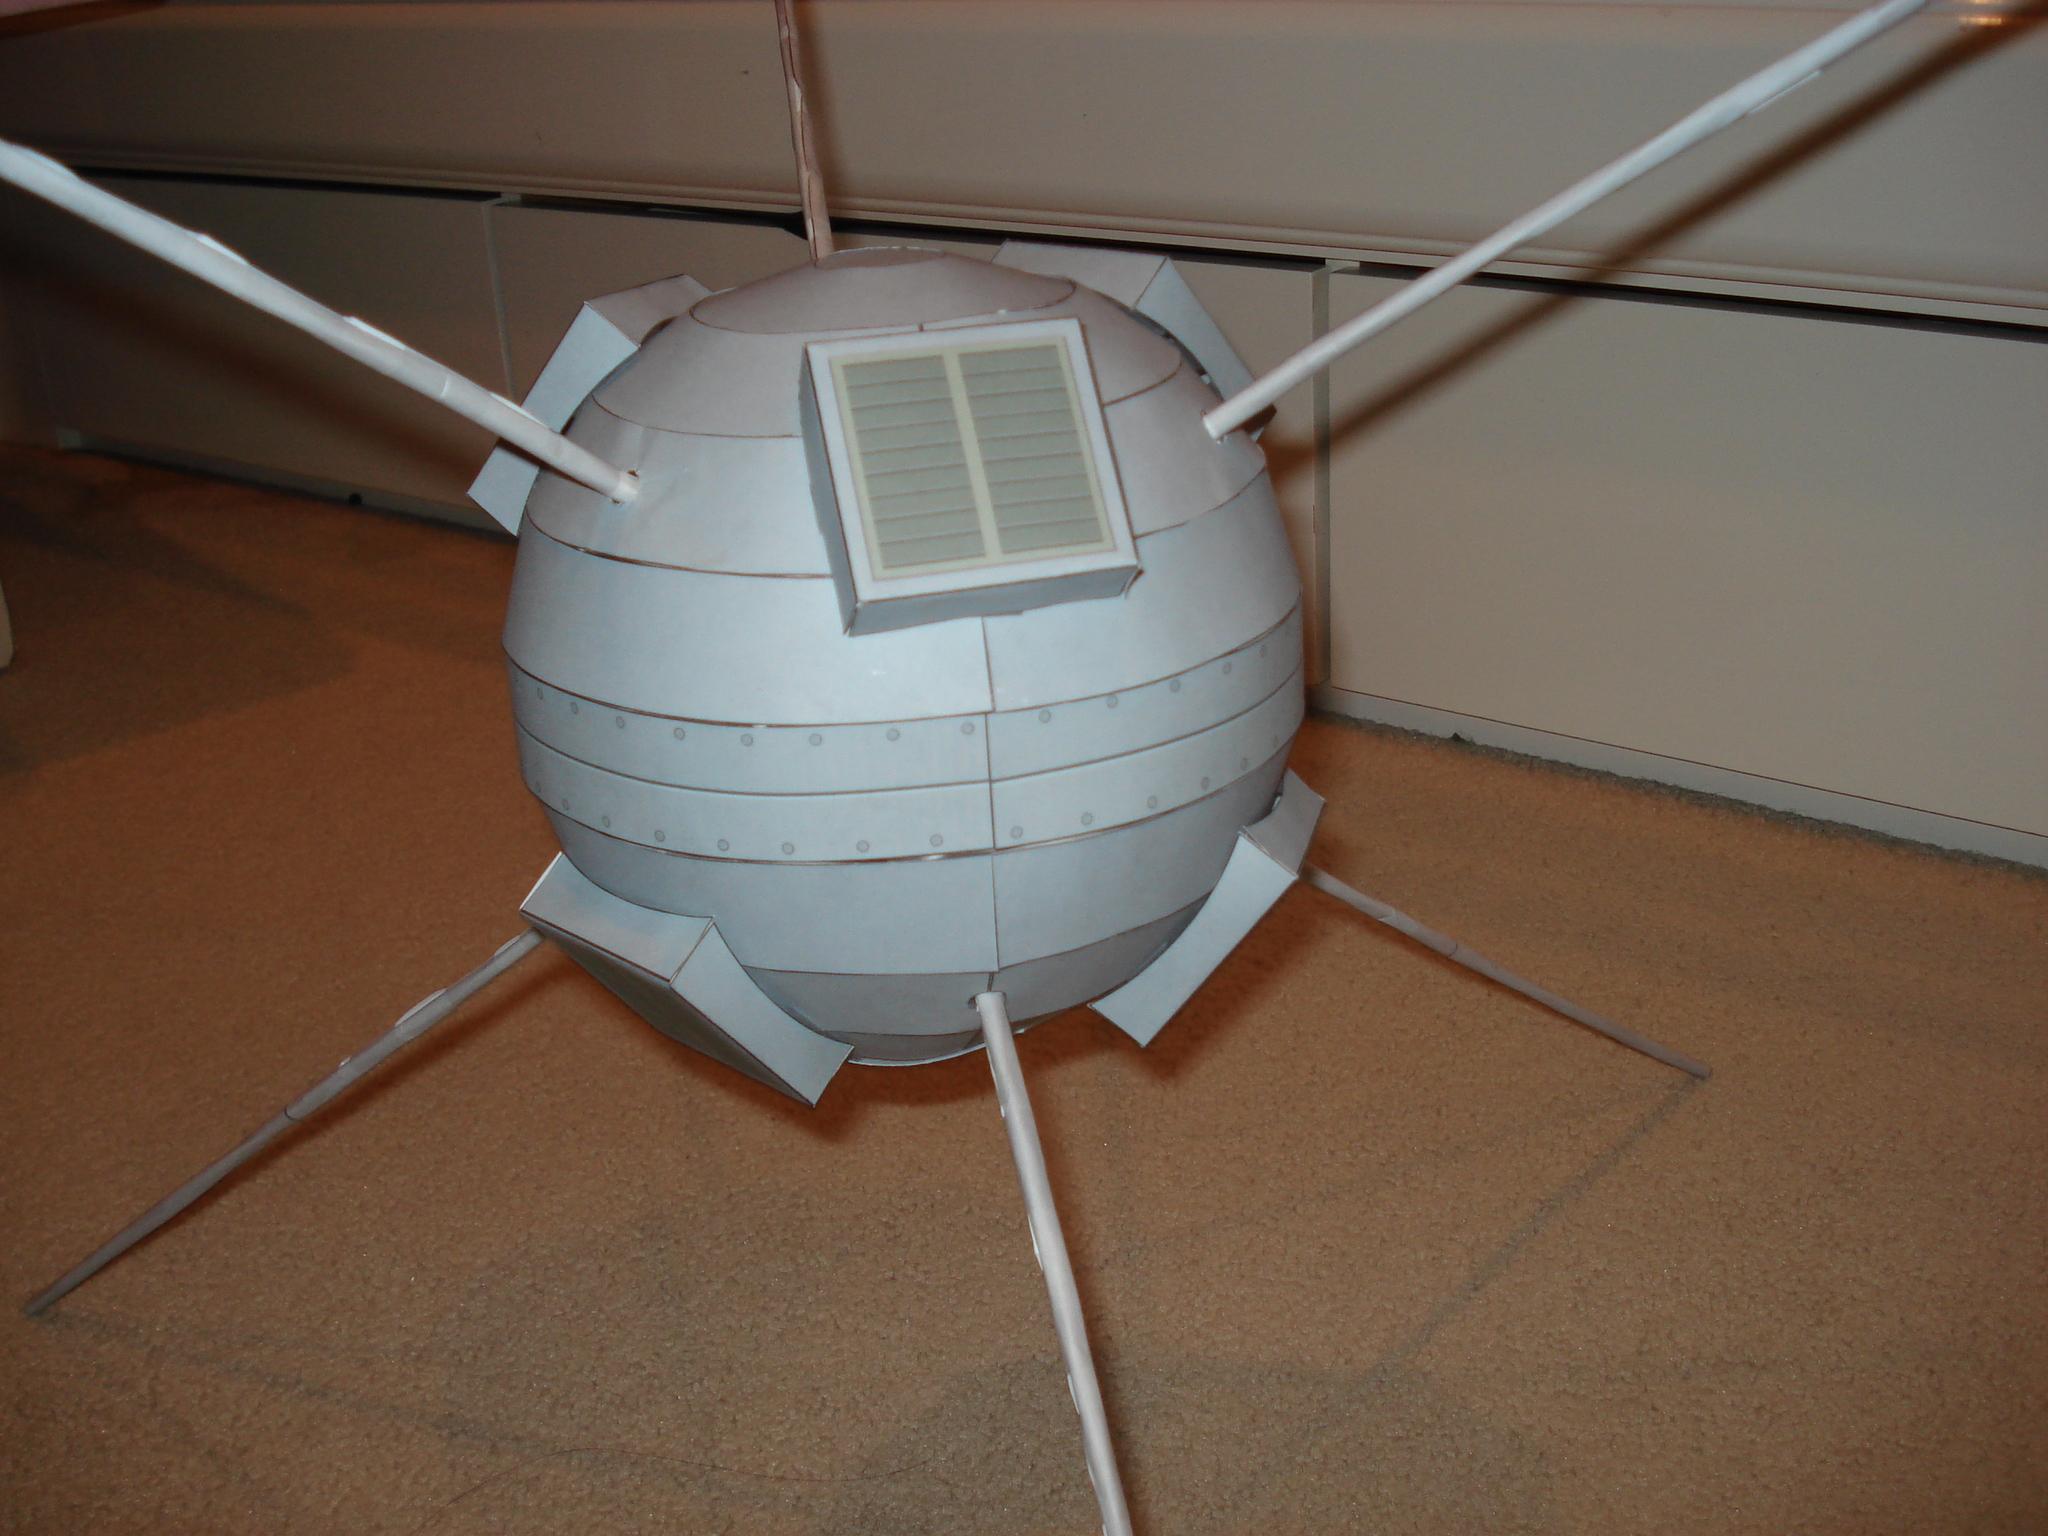 Full size Vanguard 1 Spacecraft papercraft by RocketmanTan